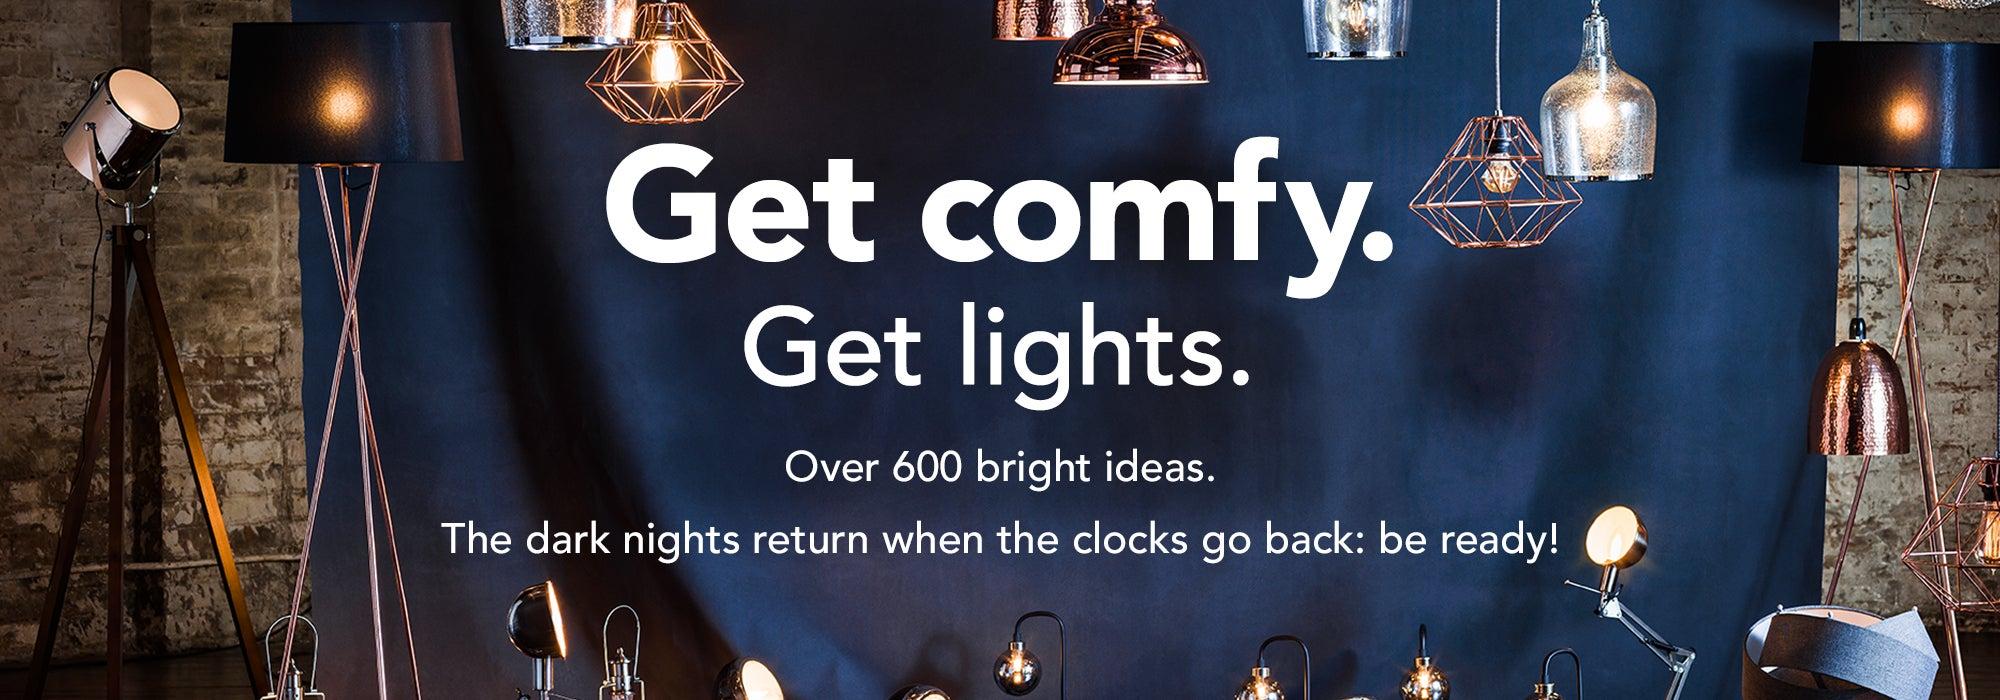 Get comfy. Get lights.